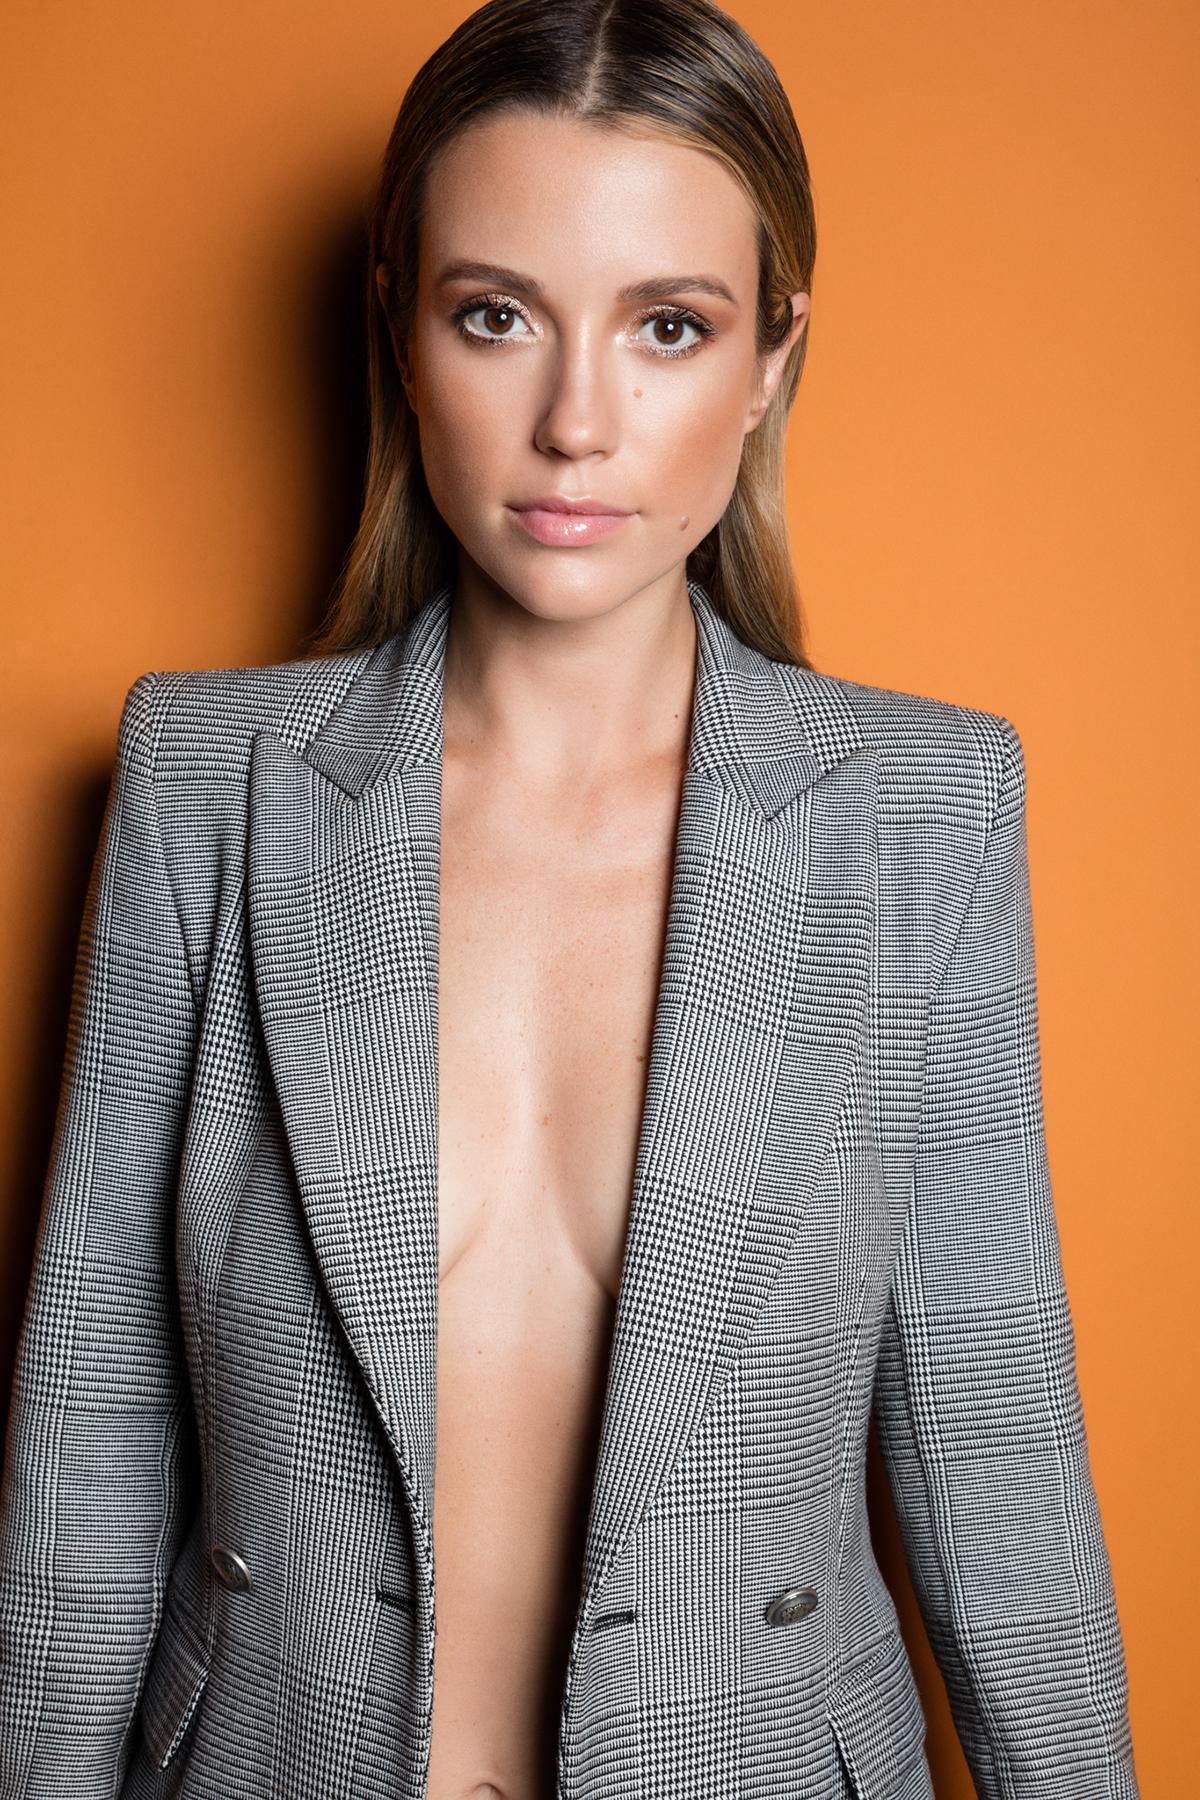 Juliana Didone